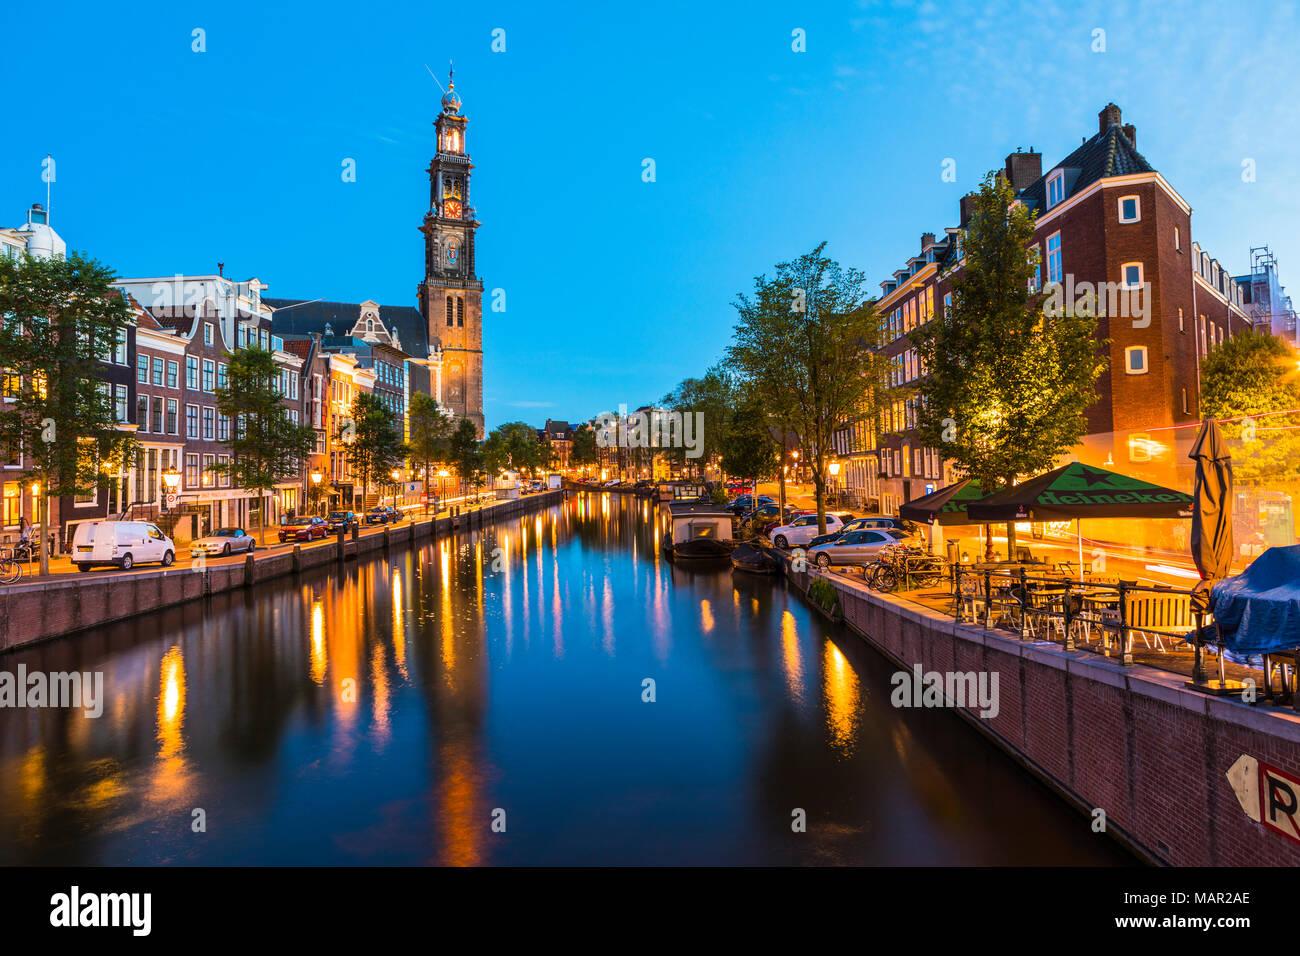 Prinsengracht Canal and Westerkerk, Amsterdam, Netherlands, Europe - Stock Image